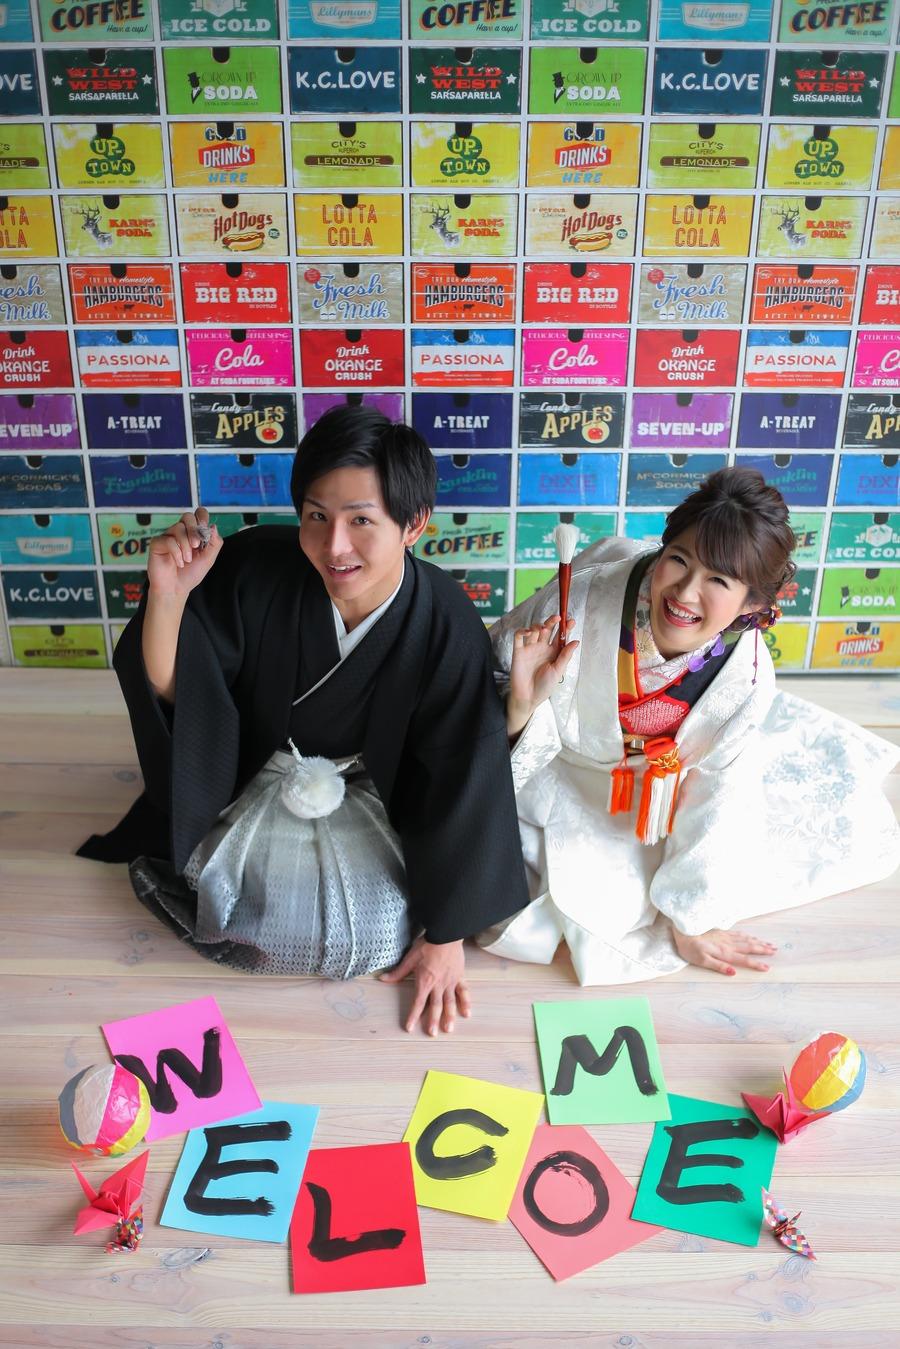 FLAGG WEDDING 滋賀にもこんな素敵なスタジオがあるんです!shiga bridal photoworks